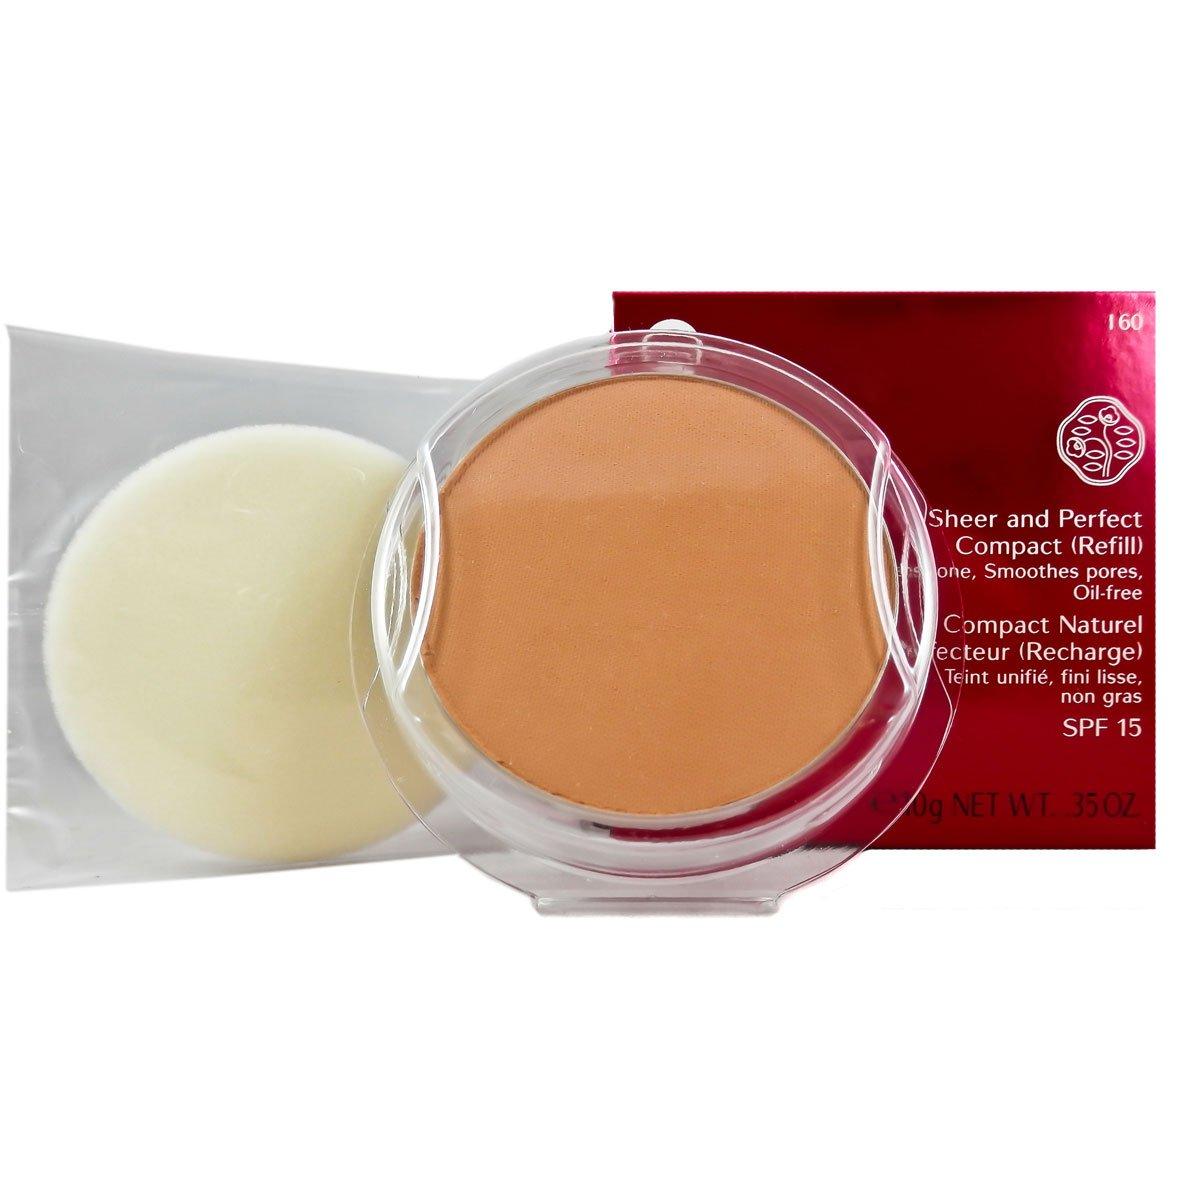 Shiseido Sheer and Perfect Refill Compact SPF 21 for Women, No. I60 Natural Deep Ivory, 0.35 oz (Refill) PerfumeWorldWide Inc. Drop Ship KS556I6